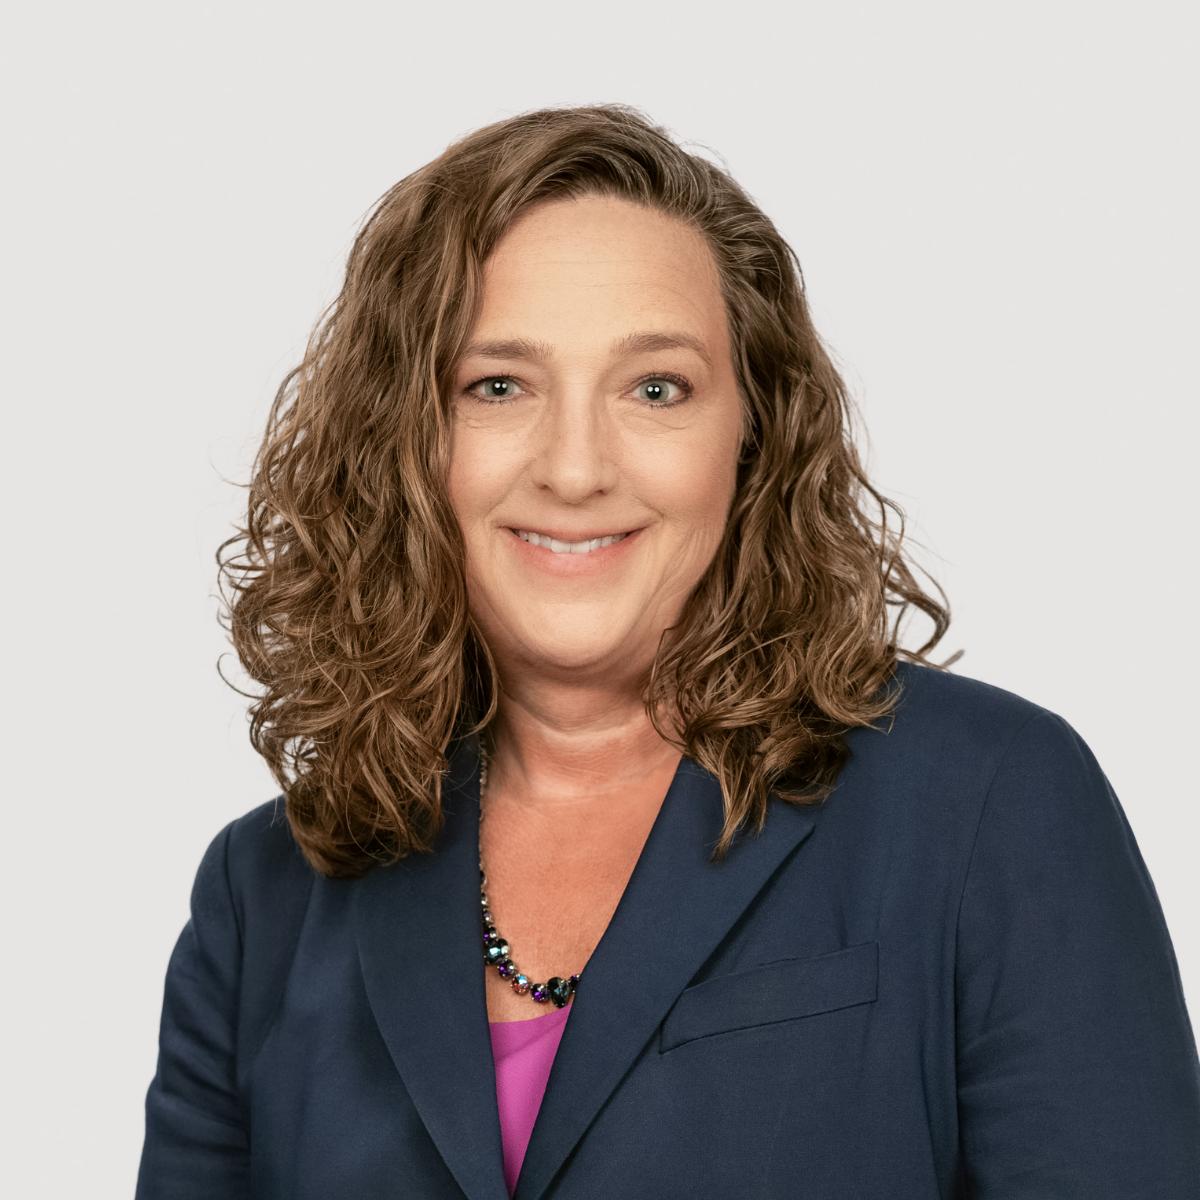 Janice V. Mitrius